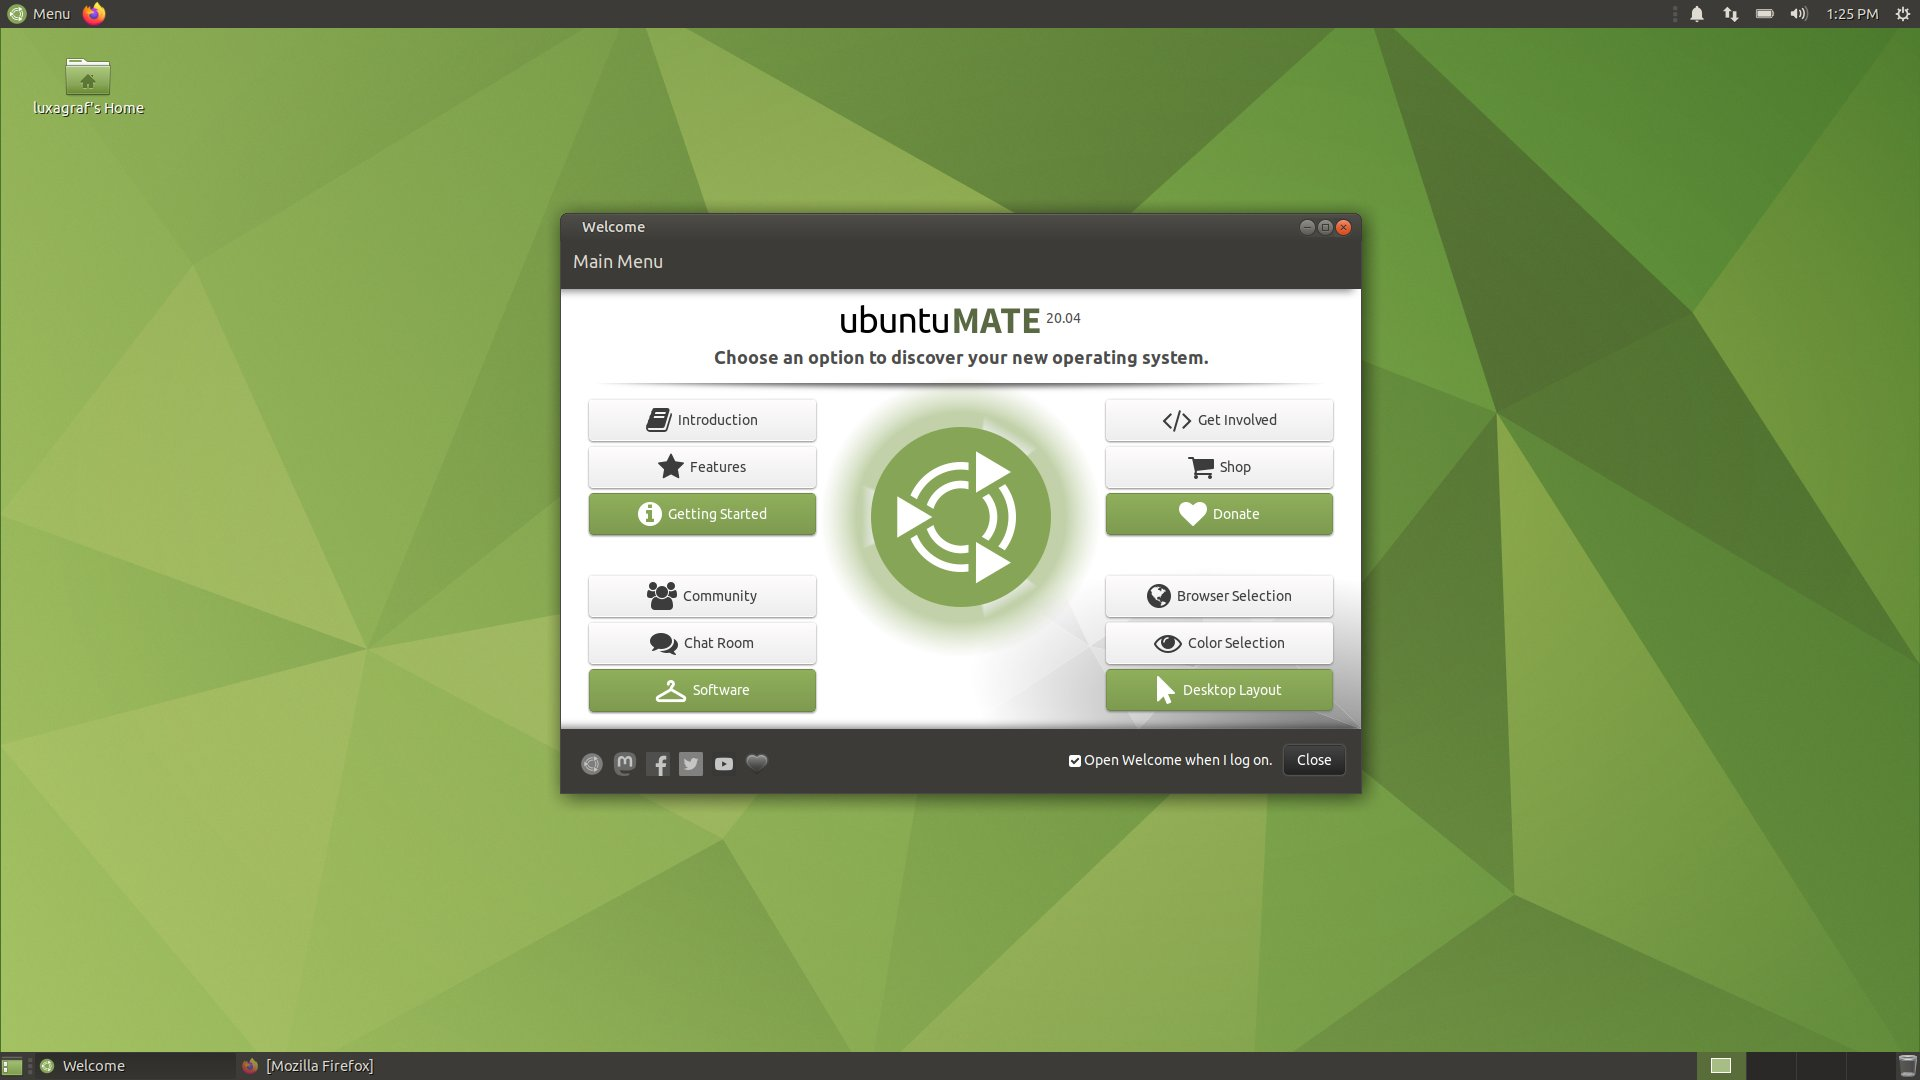 The Ubuntu MATE desktop in Ubuntu 20.04.